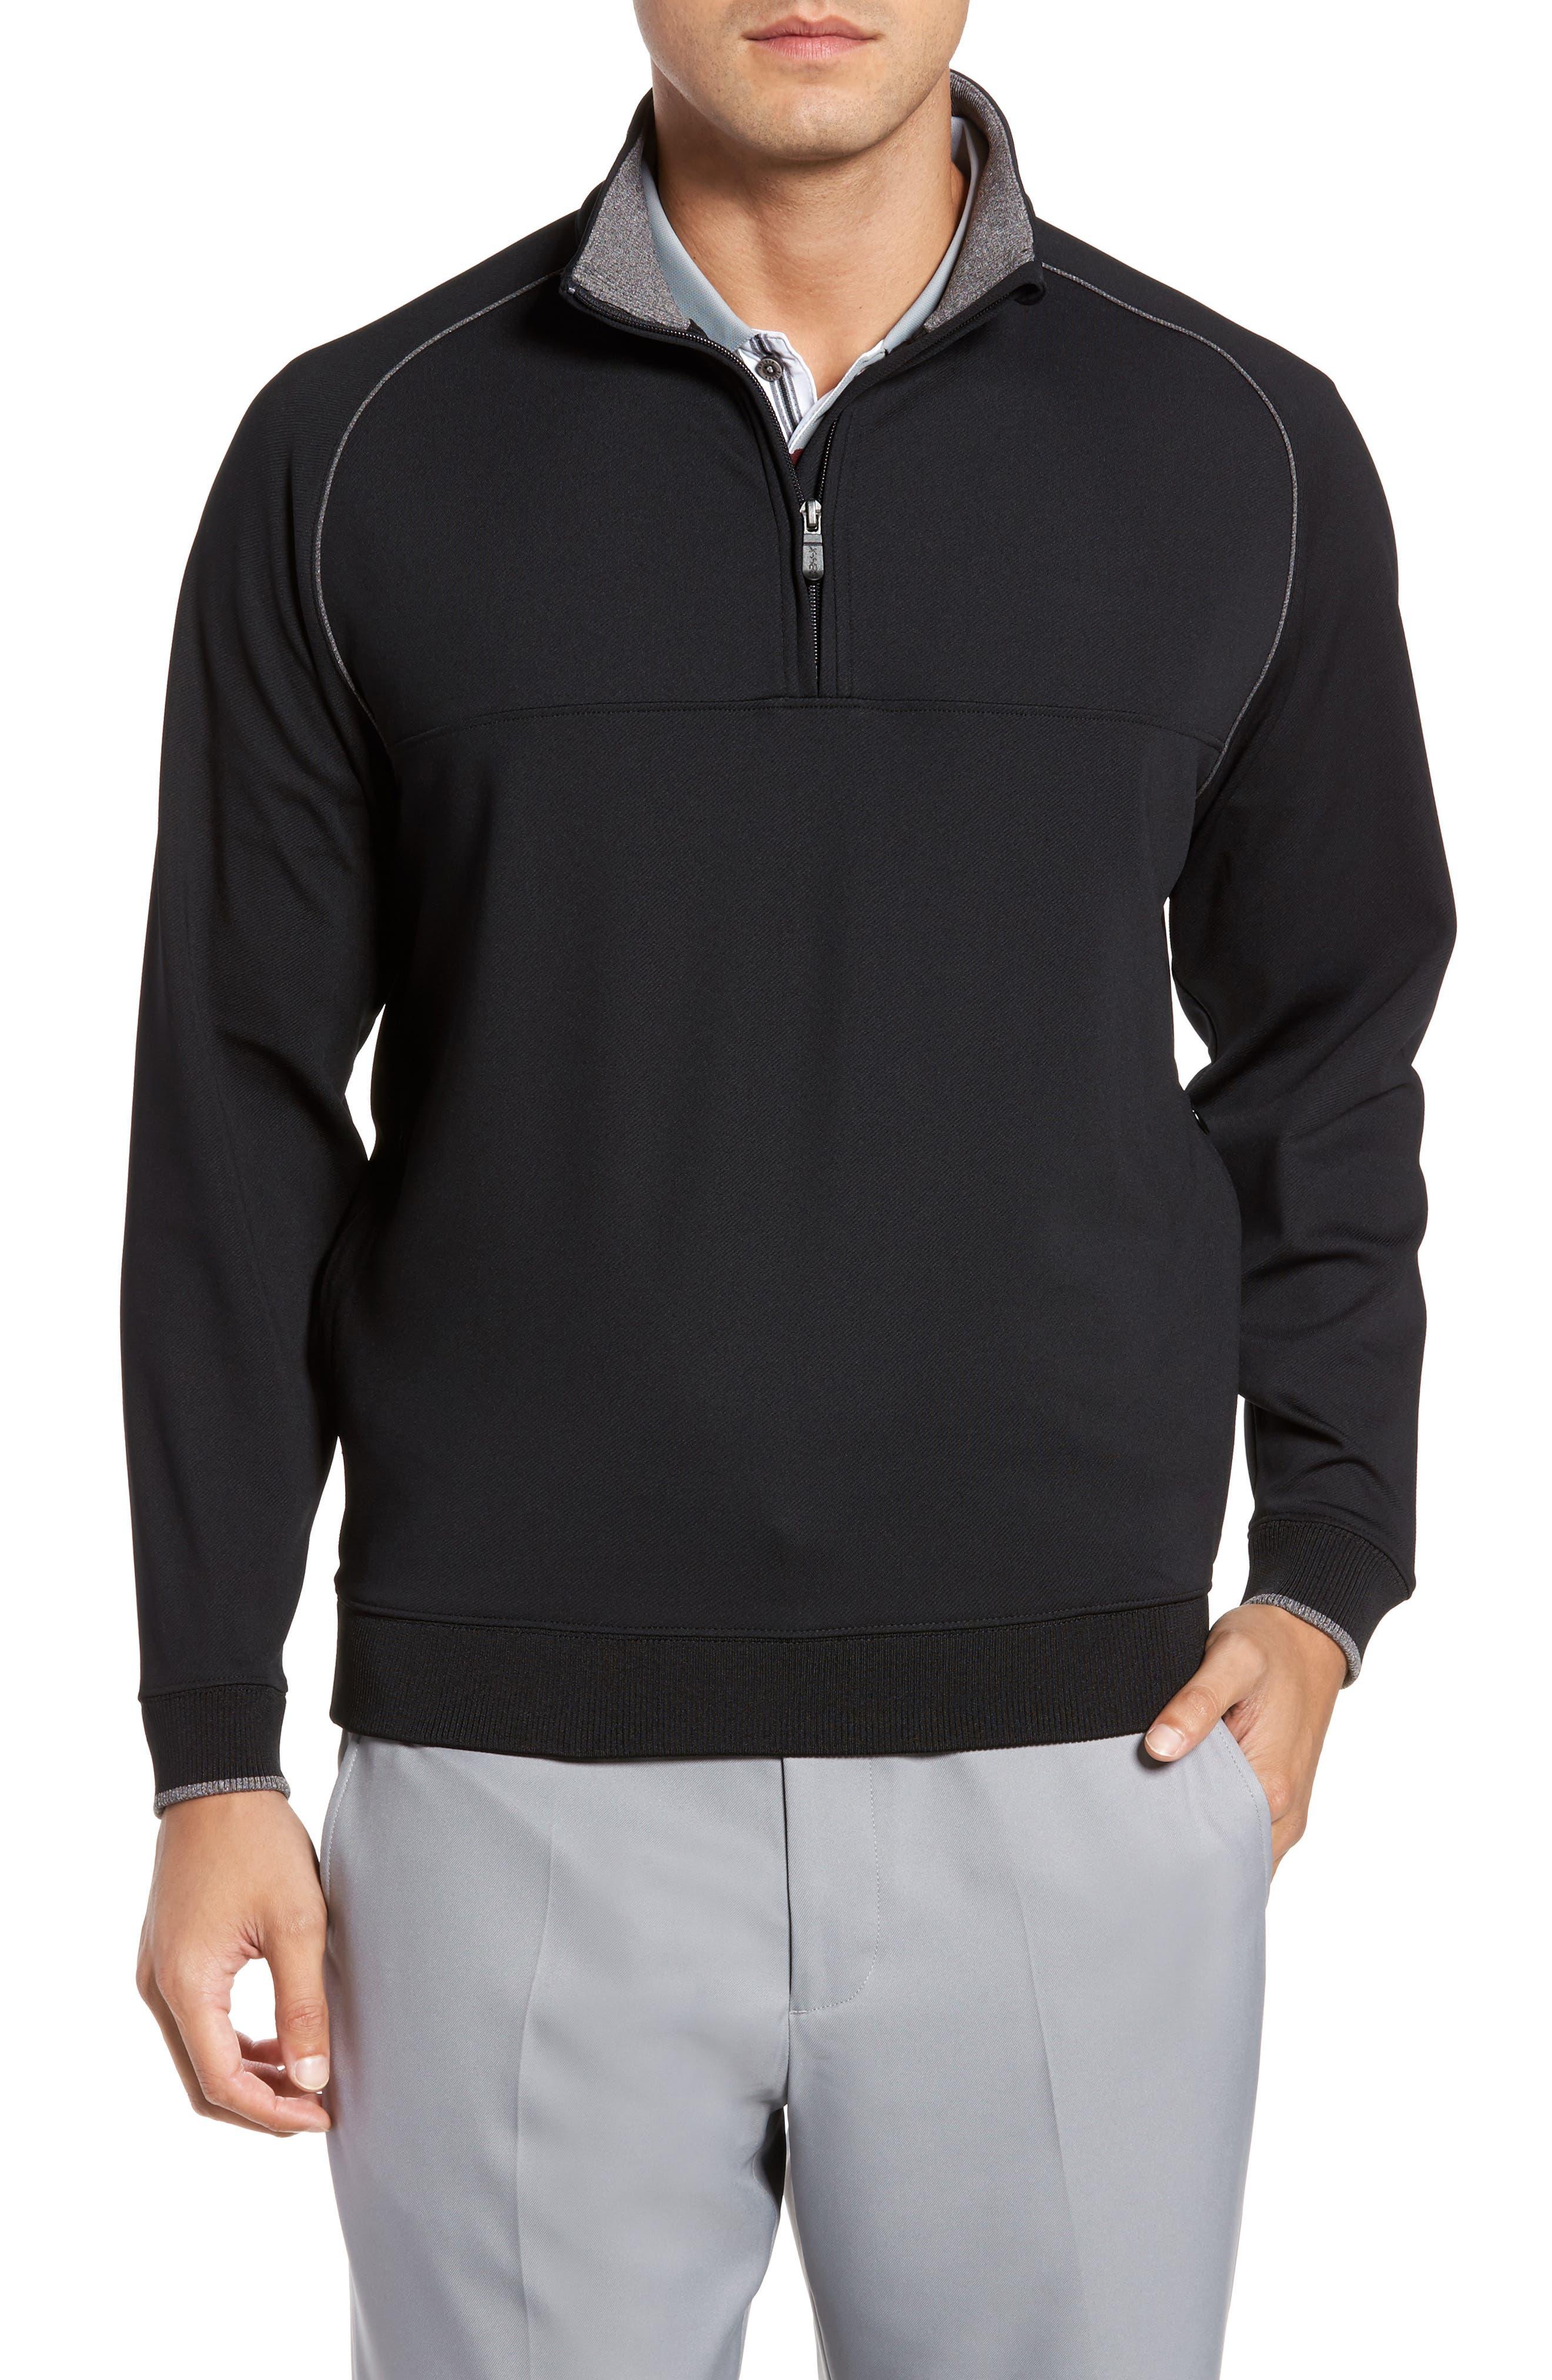 Bobby Jones XH20 Banded Bottom Pullover